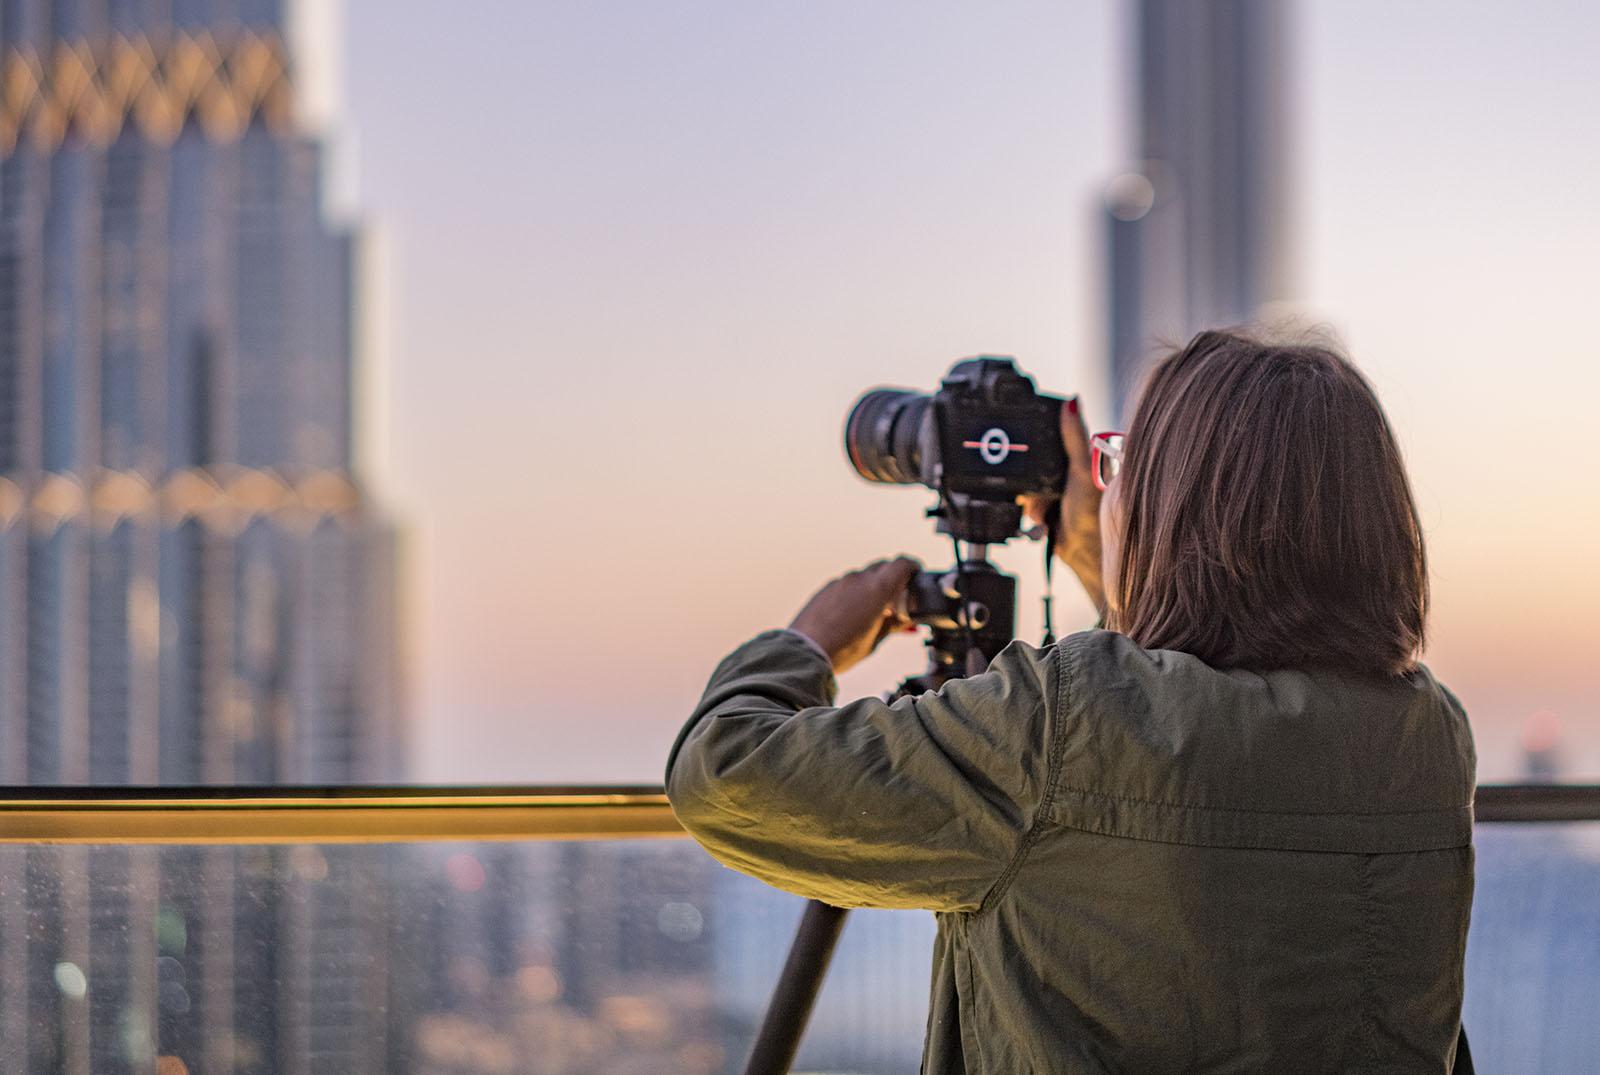 Dubai rooftop photography workshop